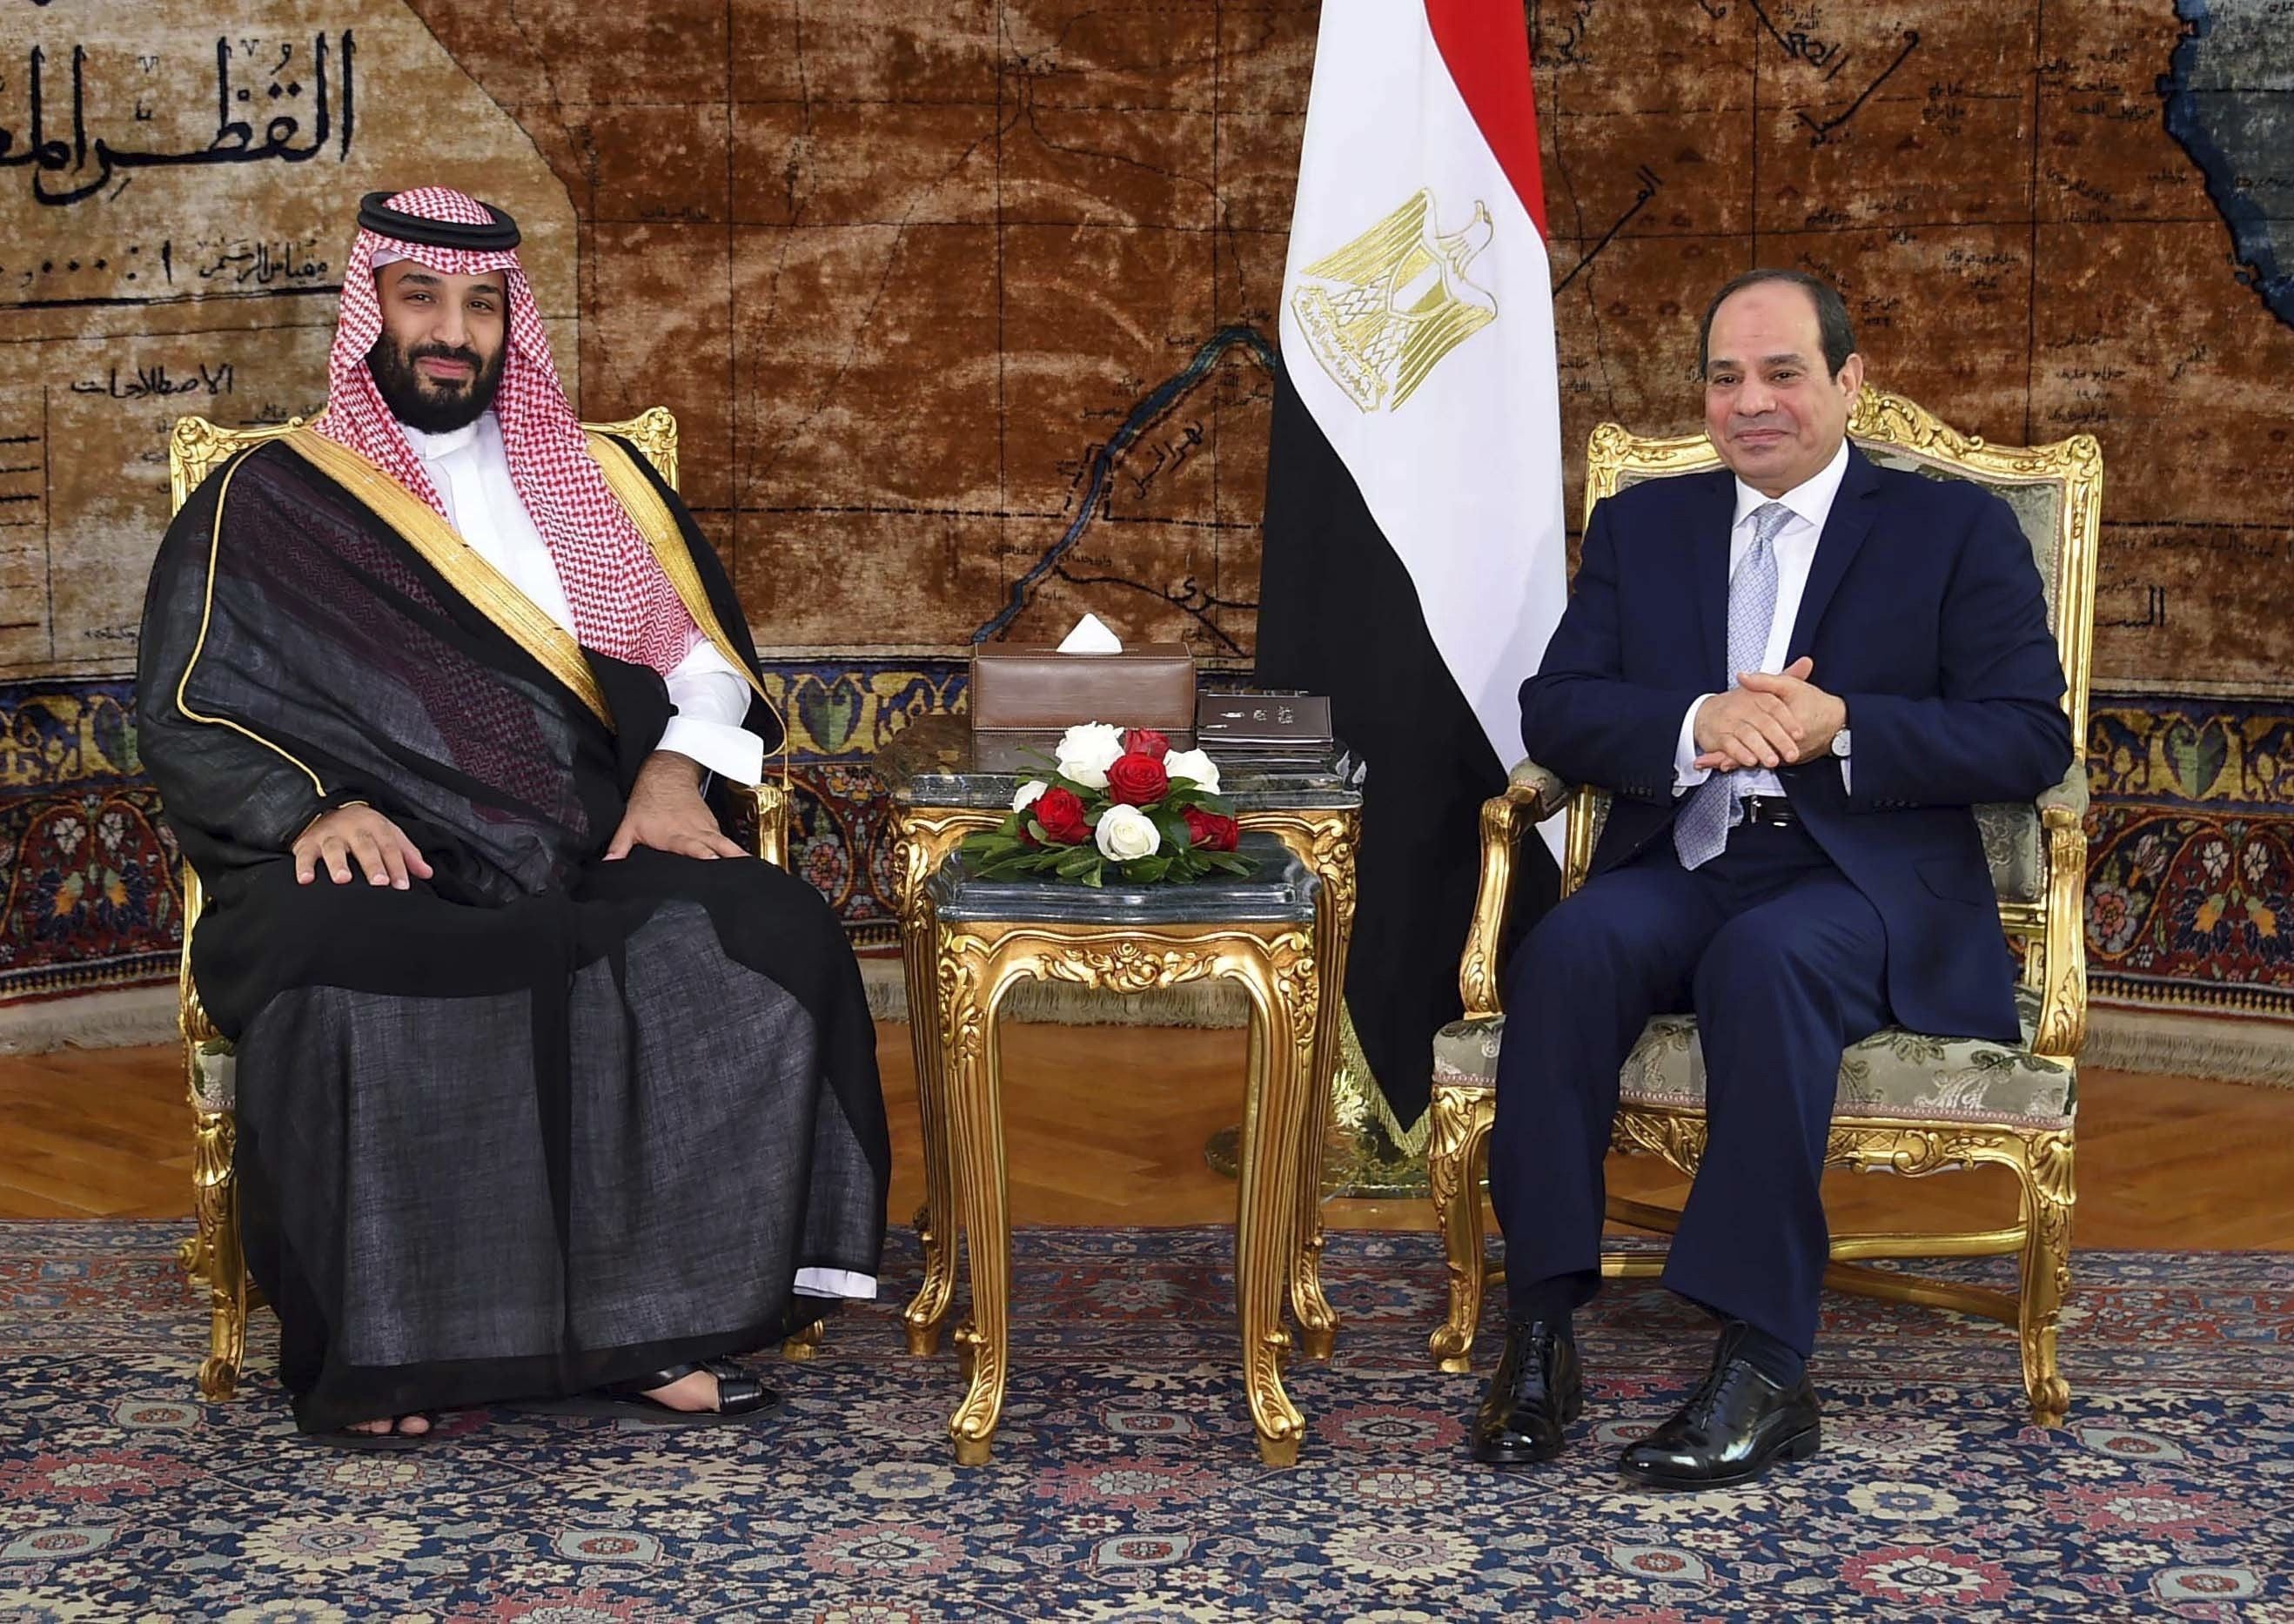 Mohammed bin Salman and Abdel Fateh al-Sisi